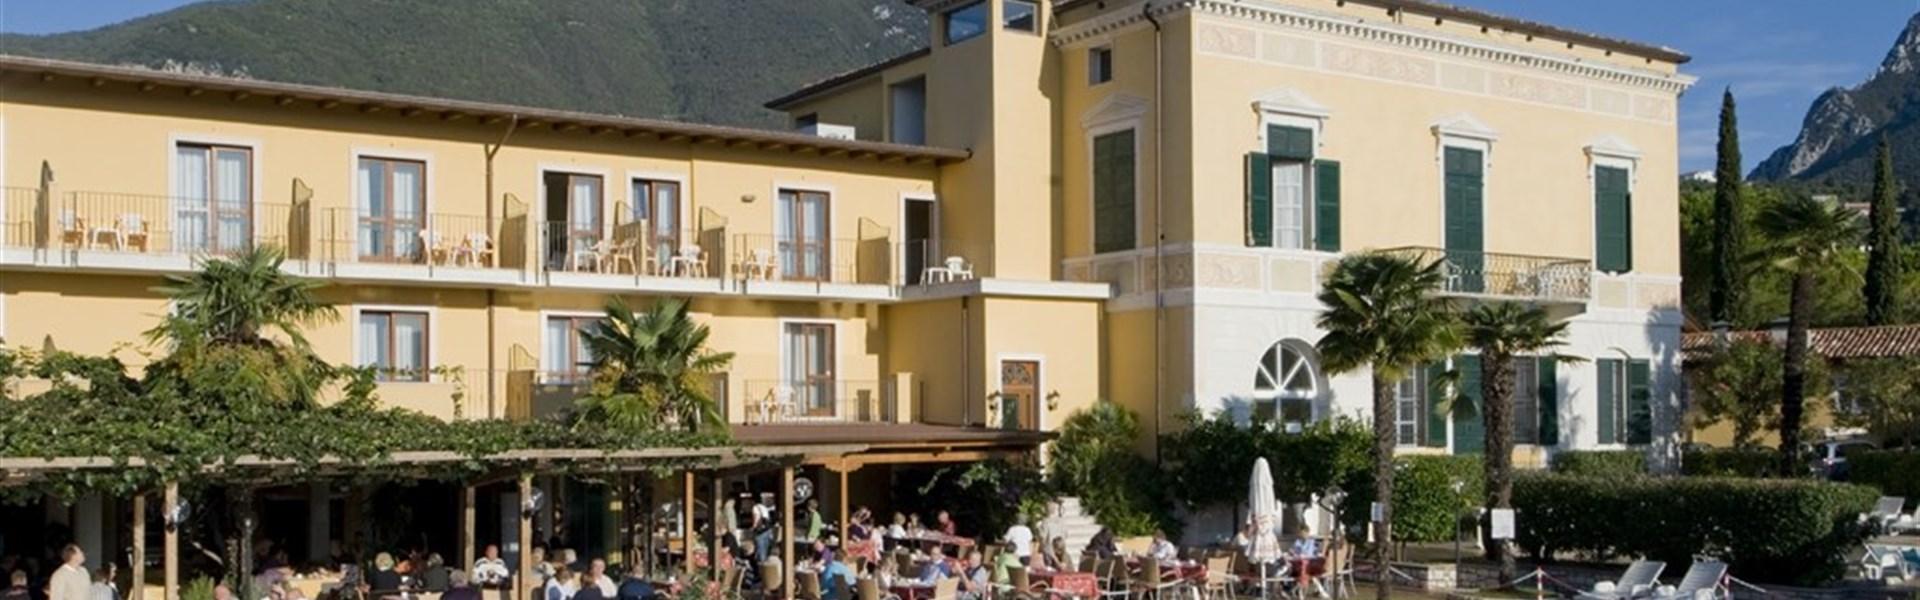 Hotel Antico Monastero -